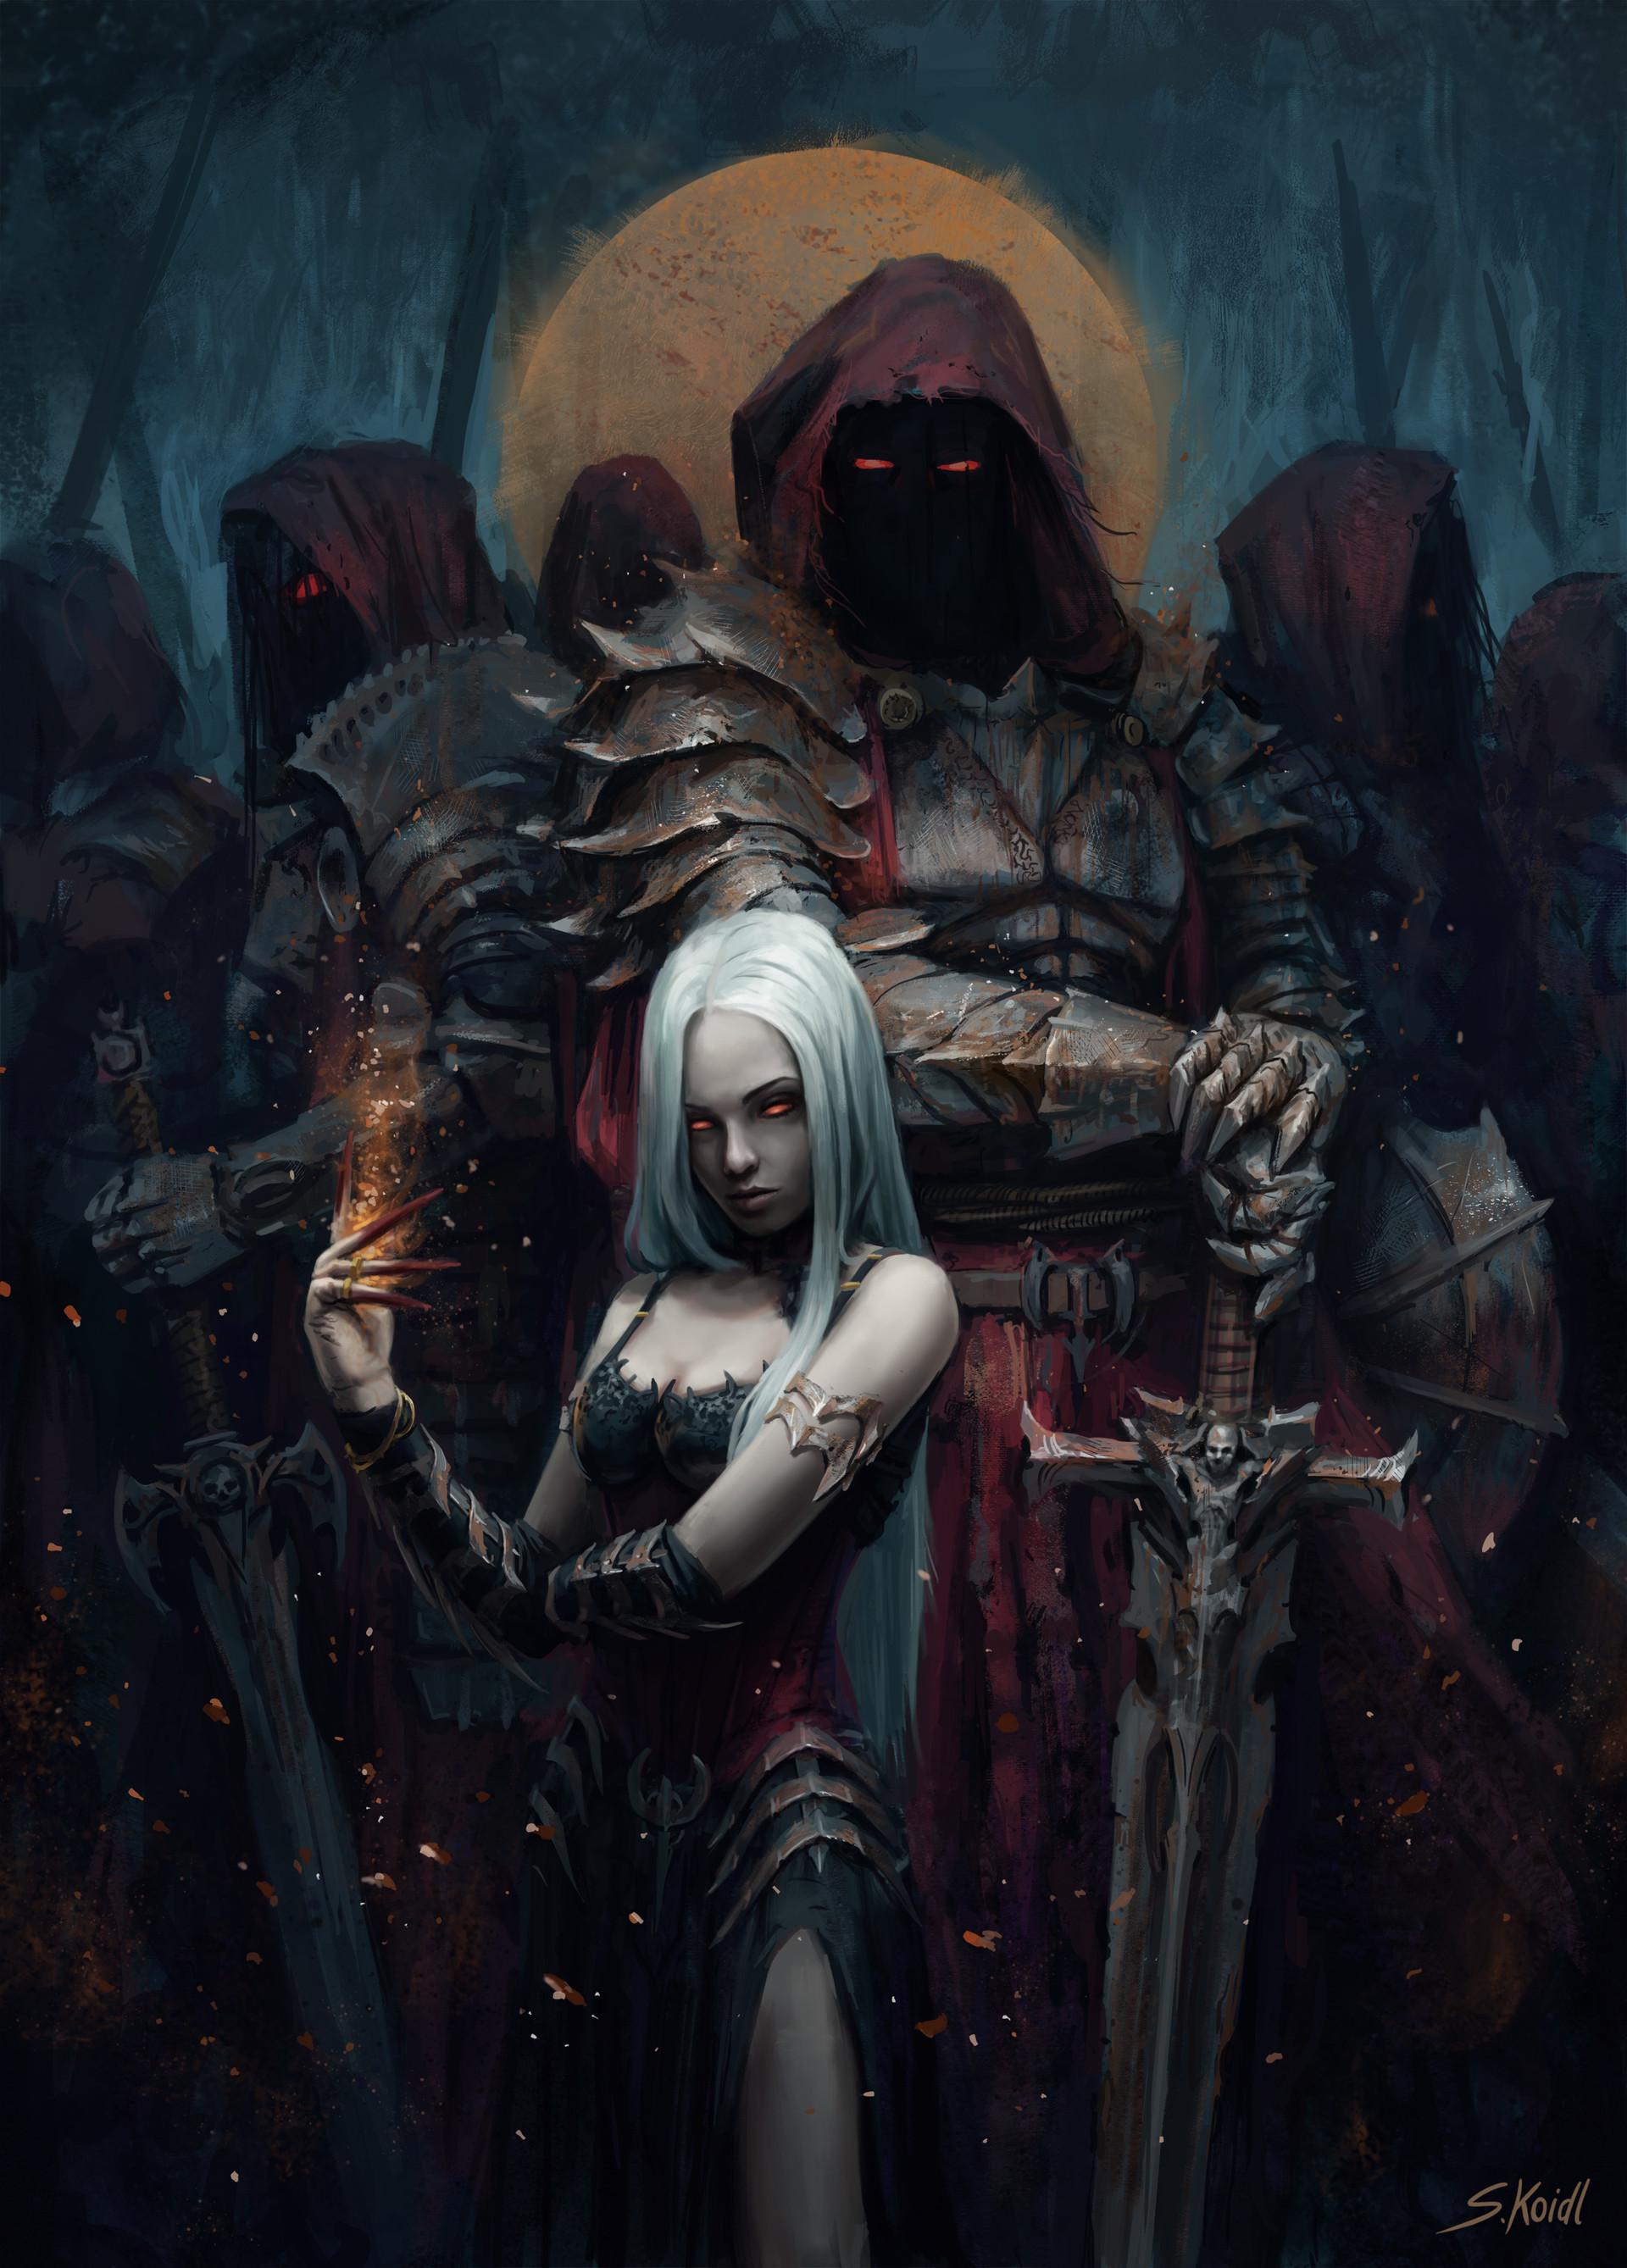 Pin by mark bilby on RPG - Mulheres | Dark fantasy art